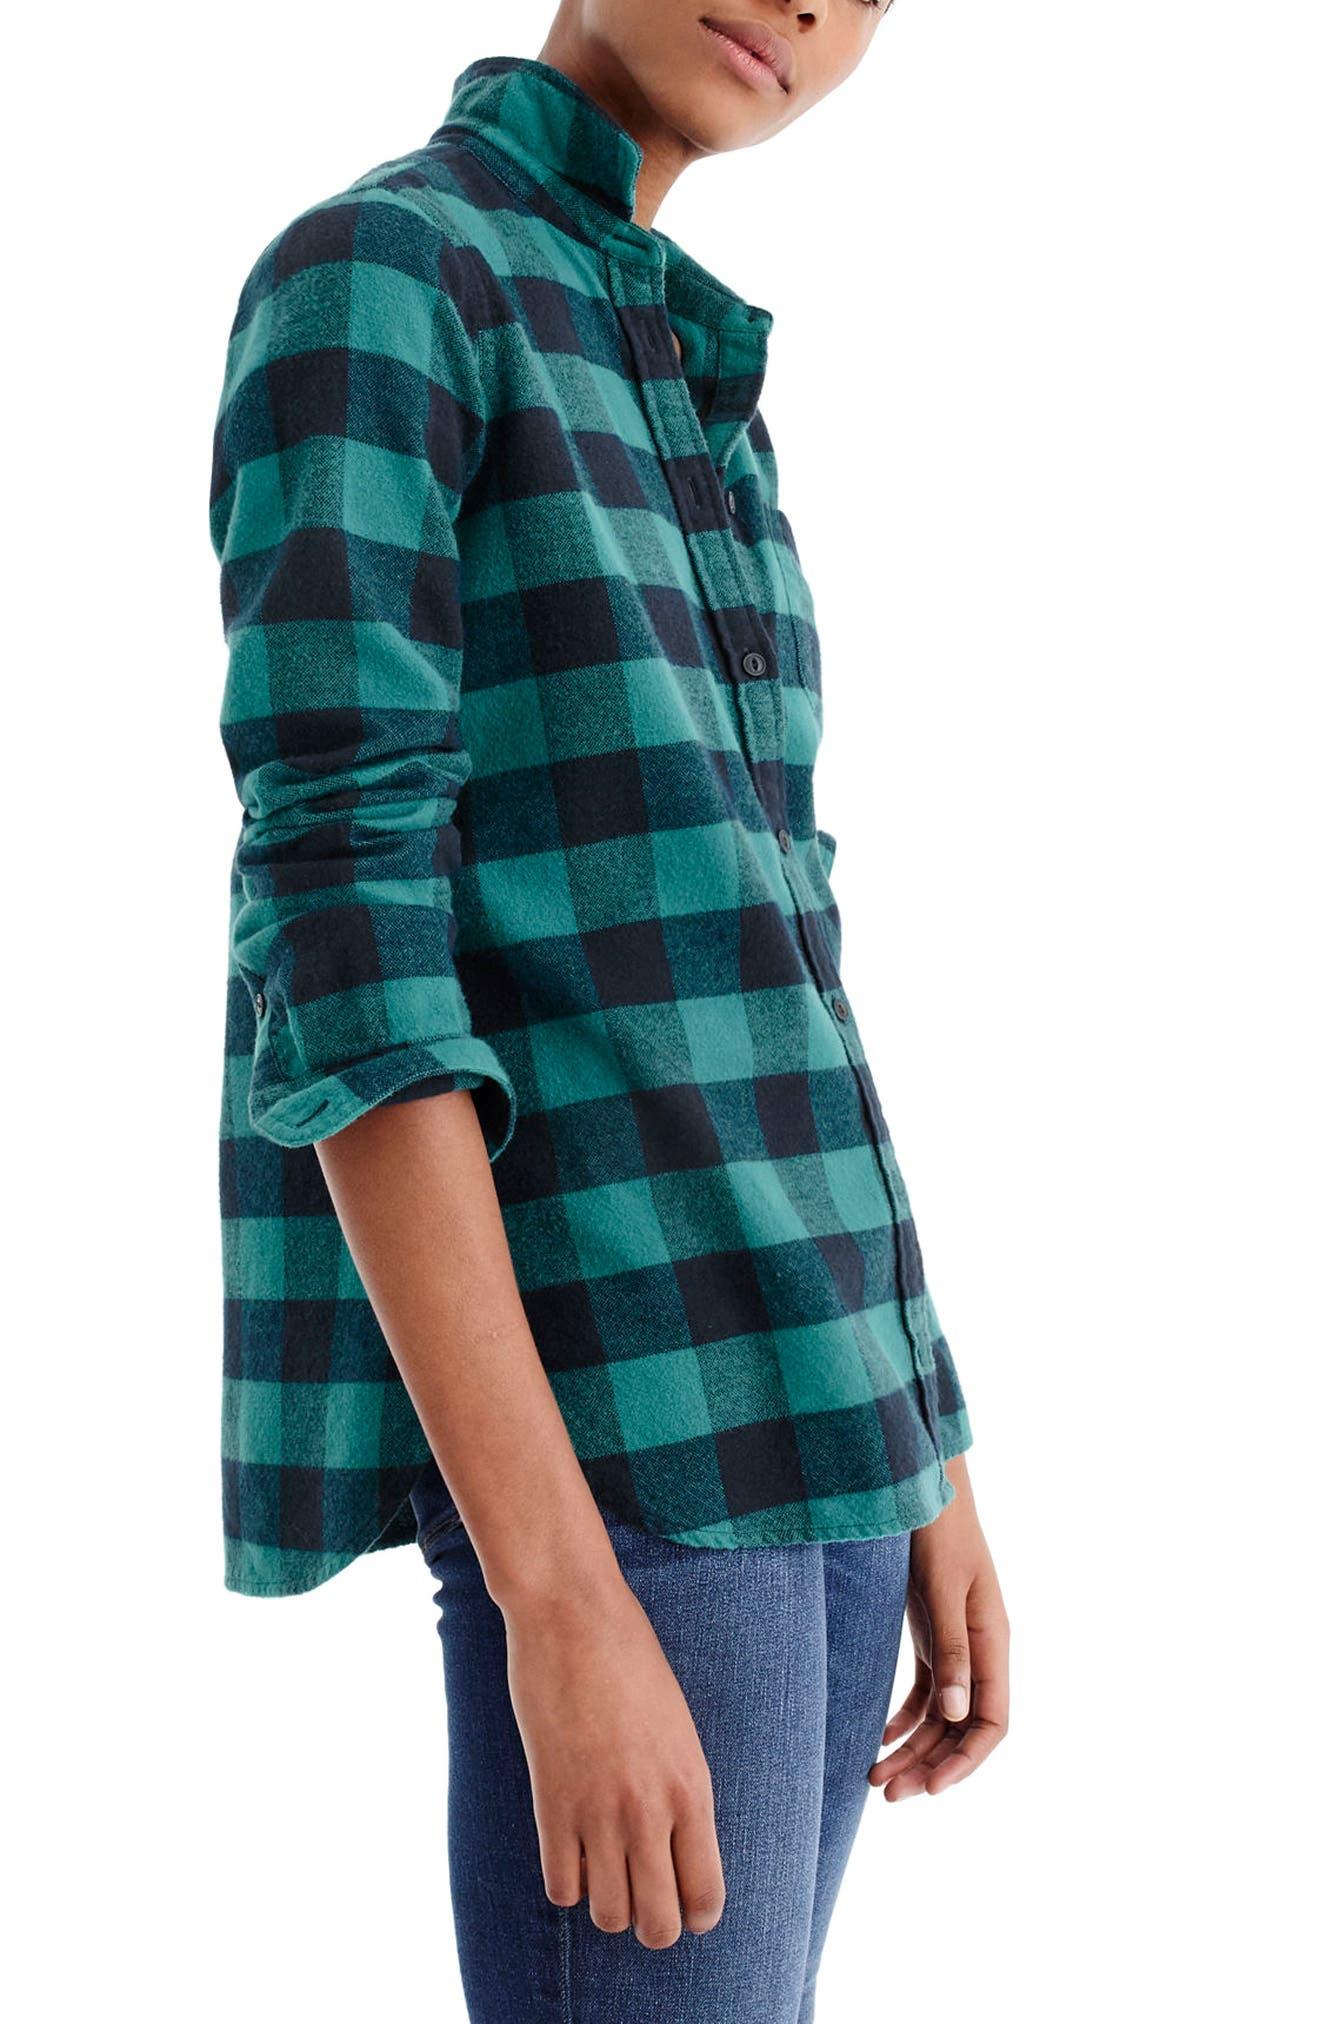 Buffalo Check Cotton & Wool Boy Shirt,                         Main,                         color, 309